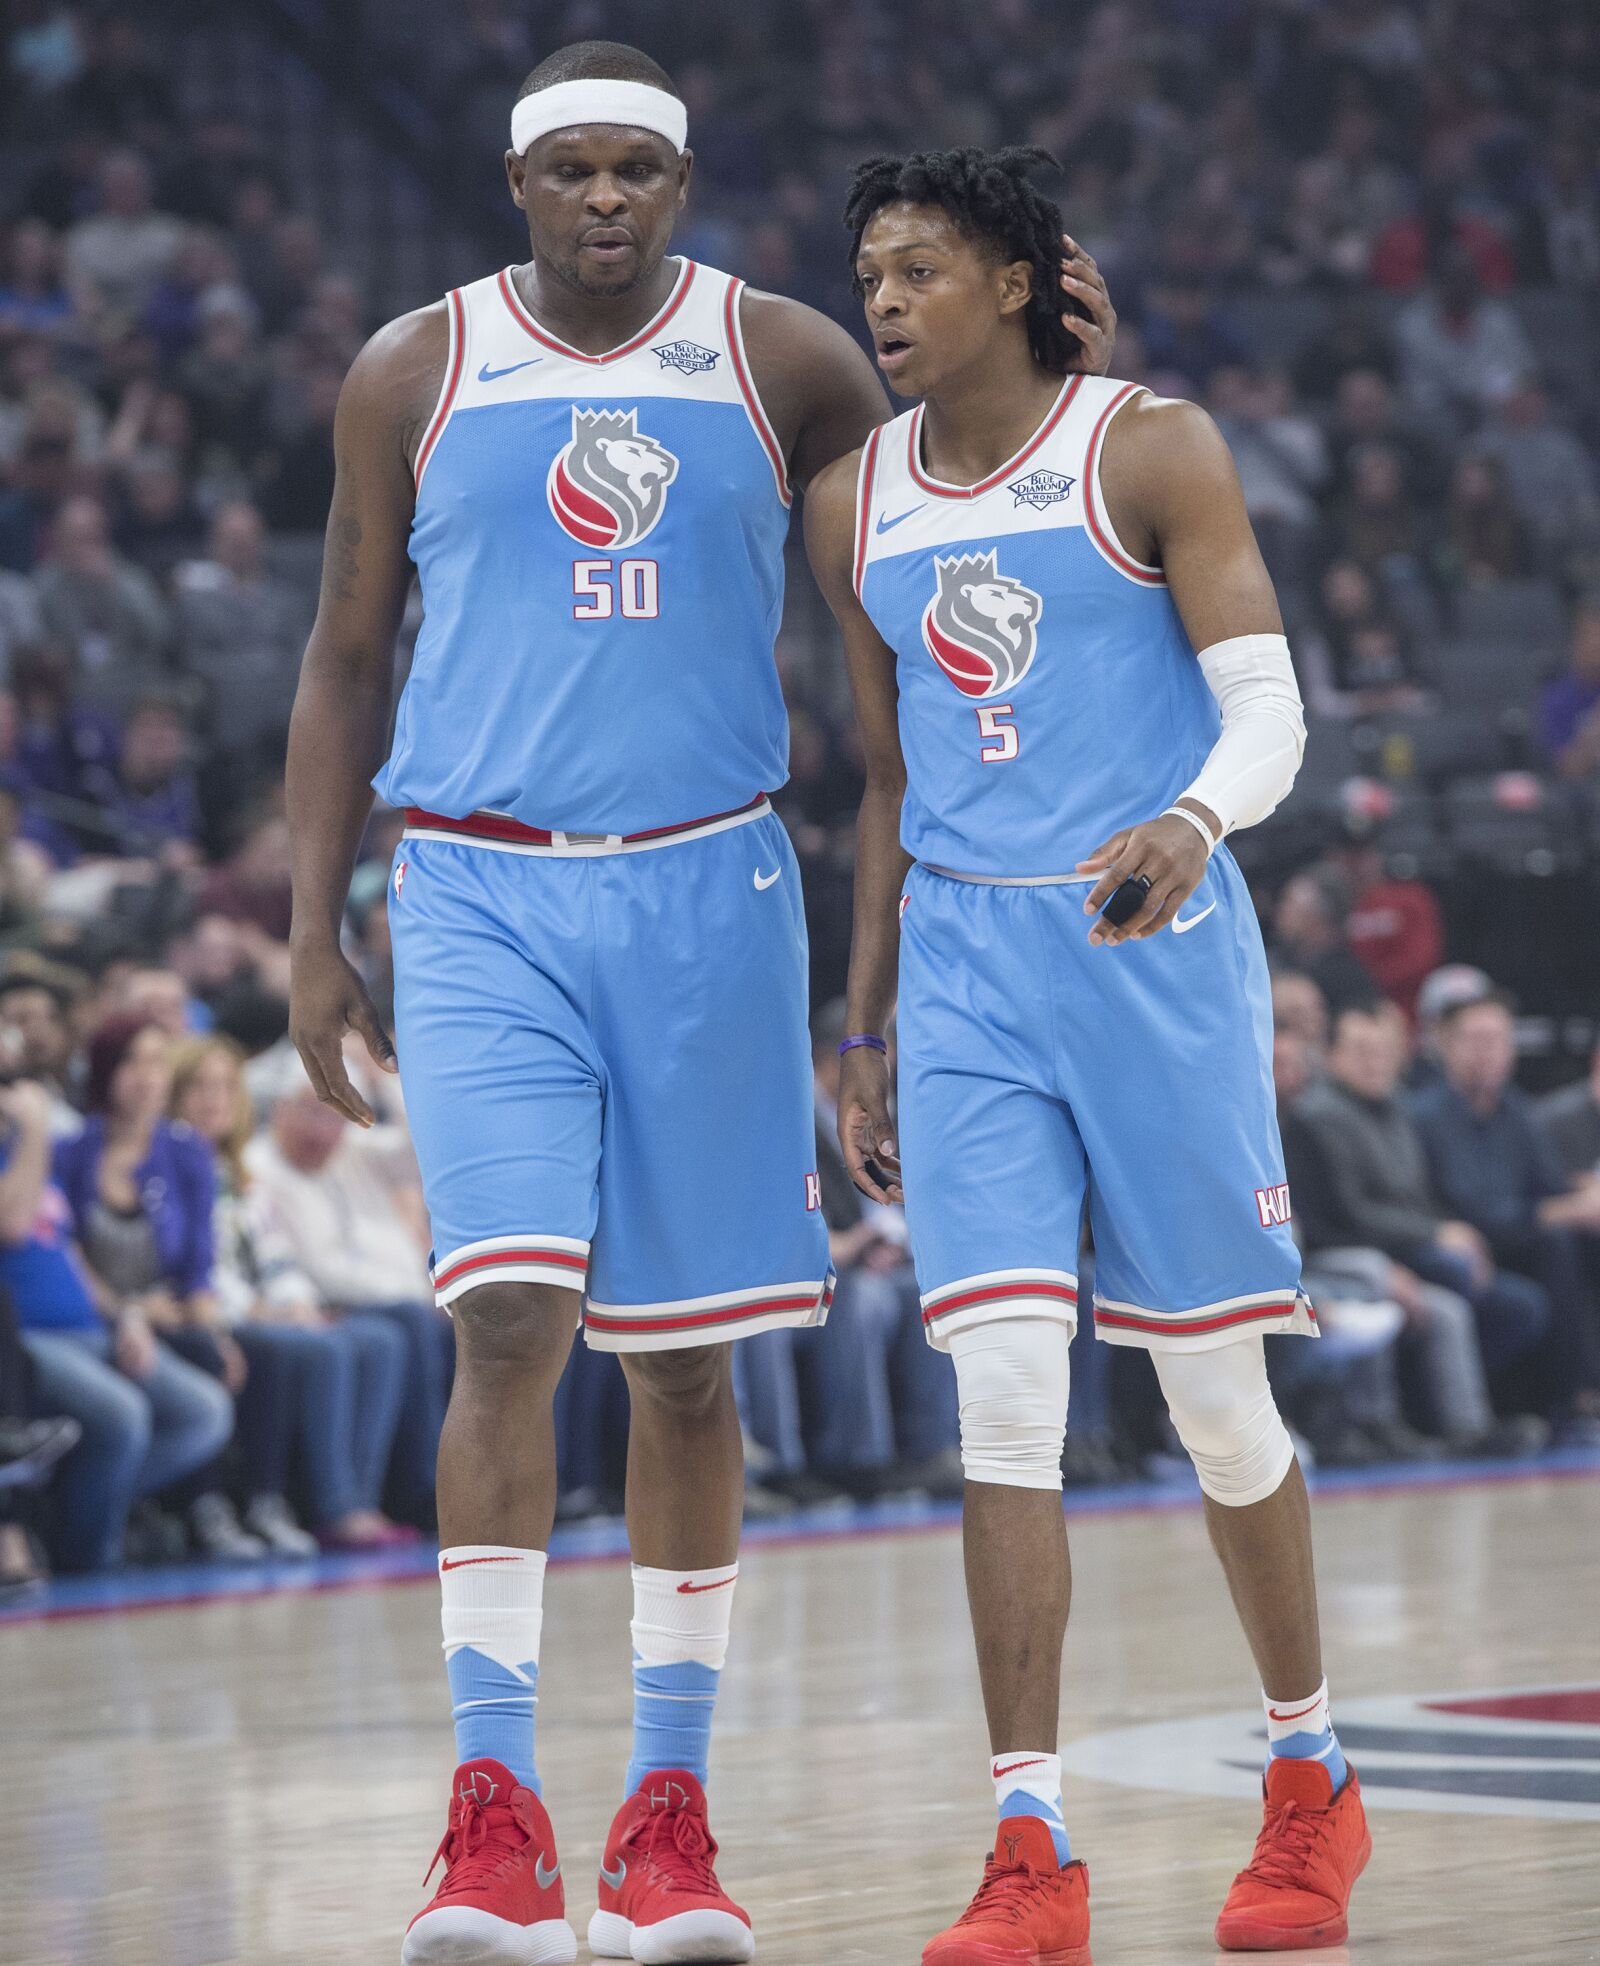 Should the Sacramento Kings prioritize winning or development?